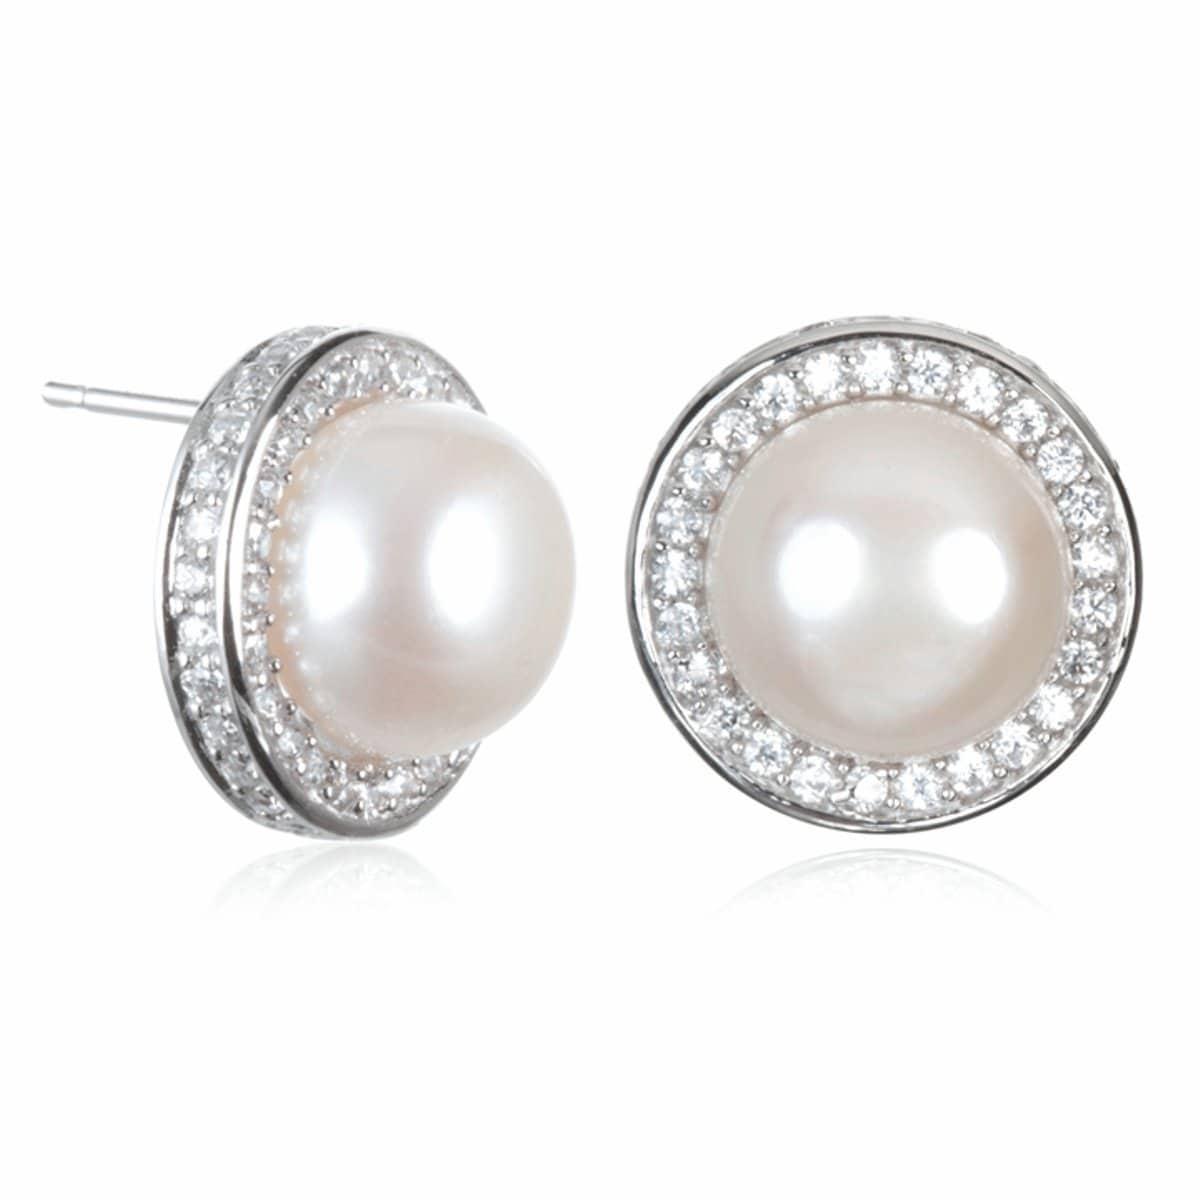 Rhodium Plated Sterling Silver Diamond Shape Stud Earrings